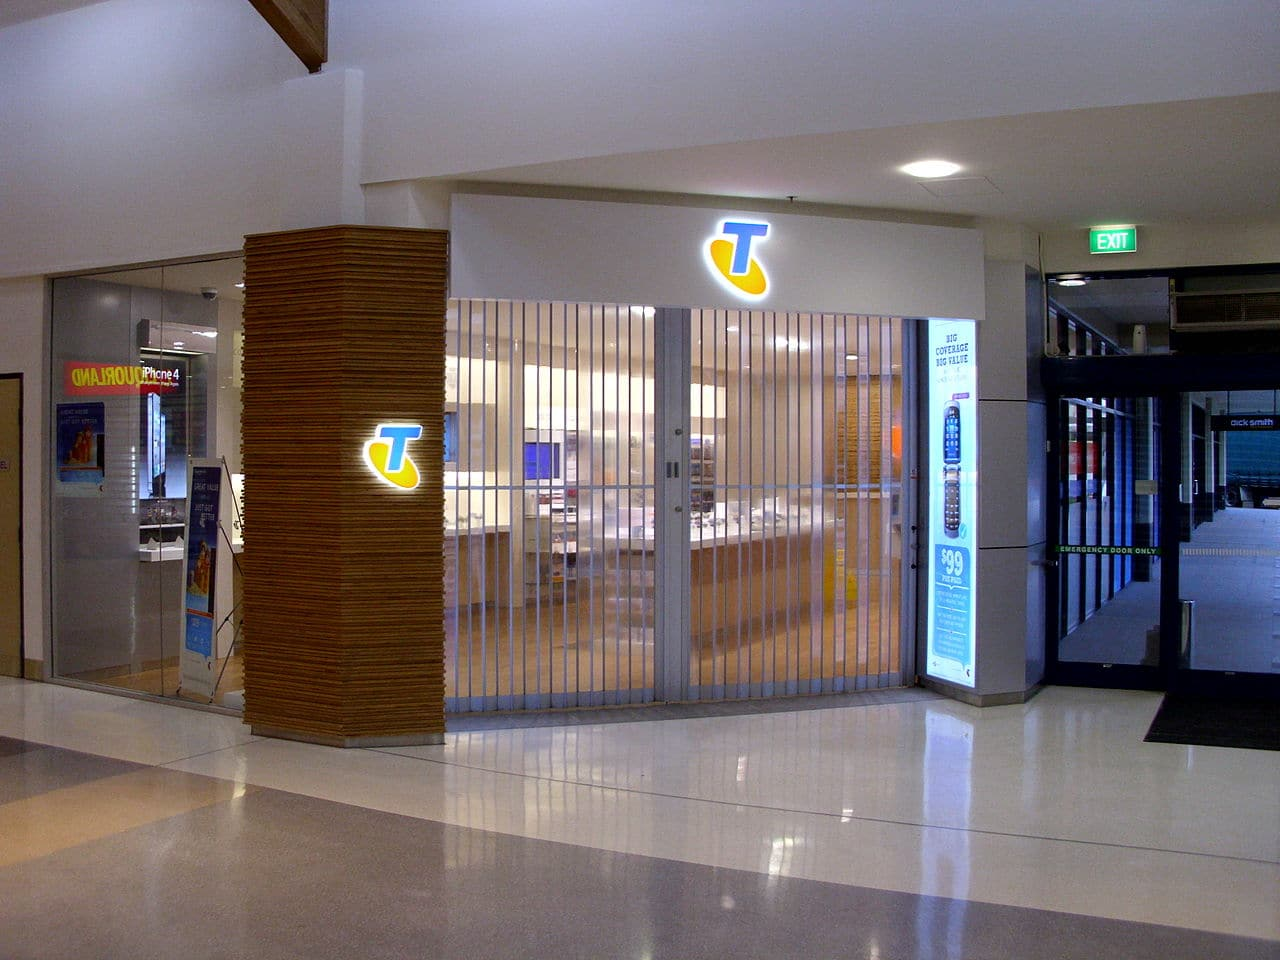 Tienda de Telstra